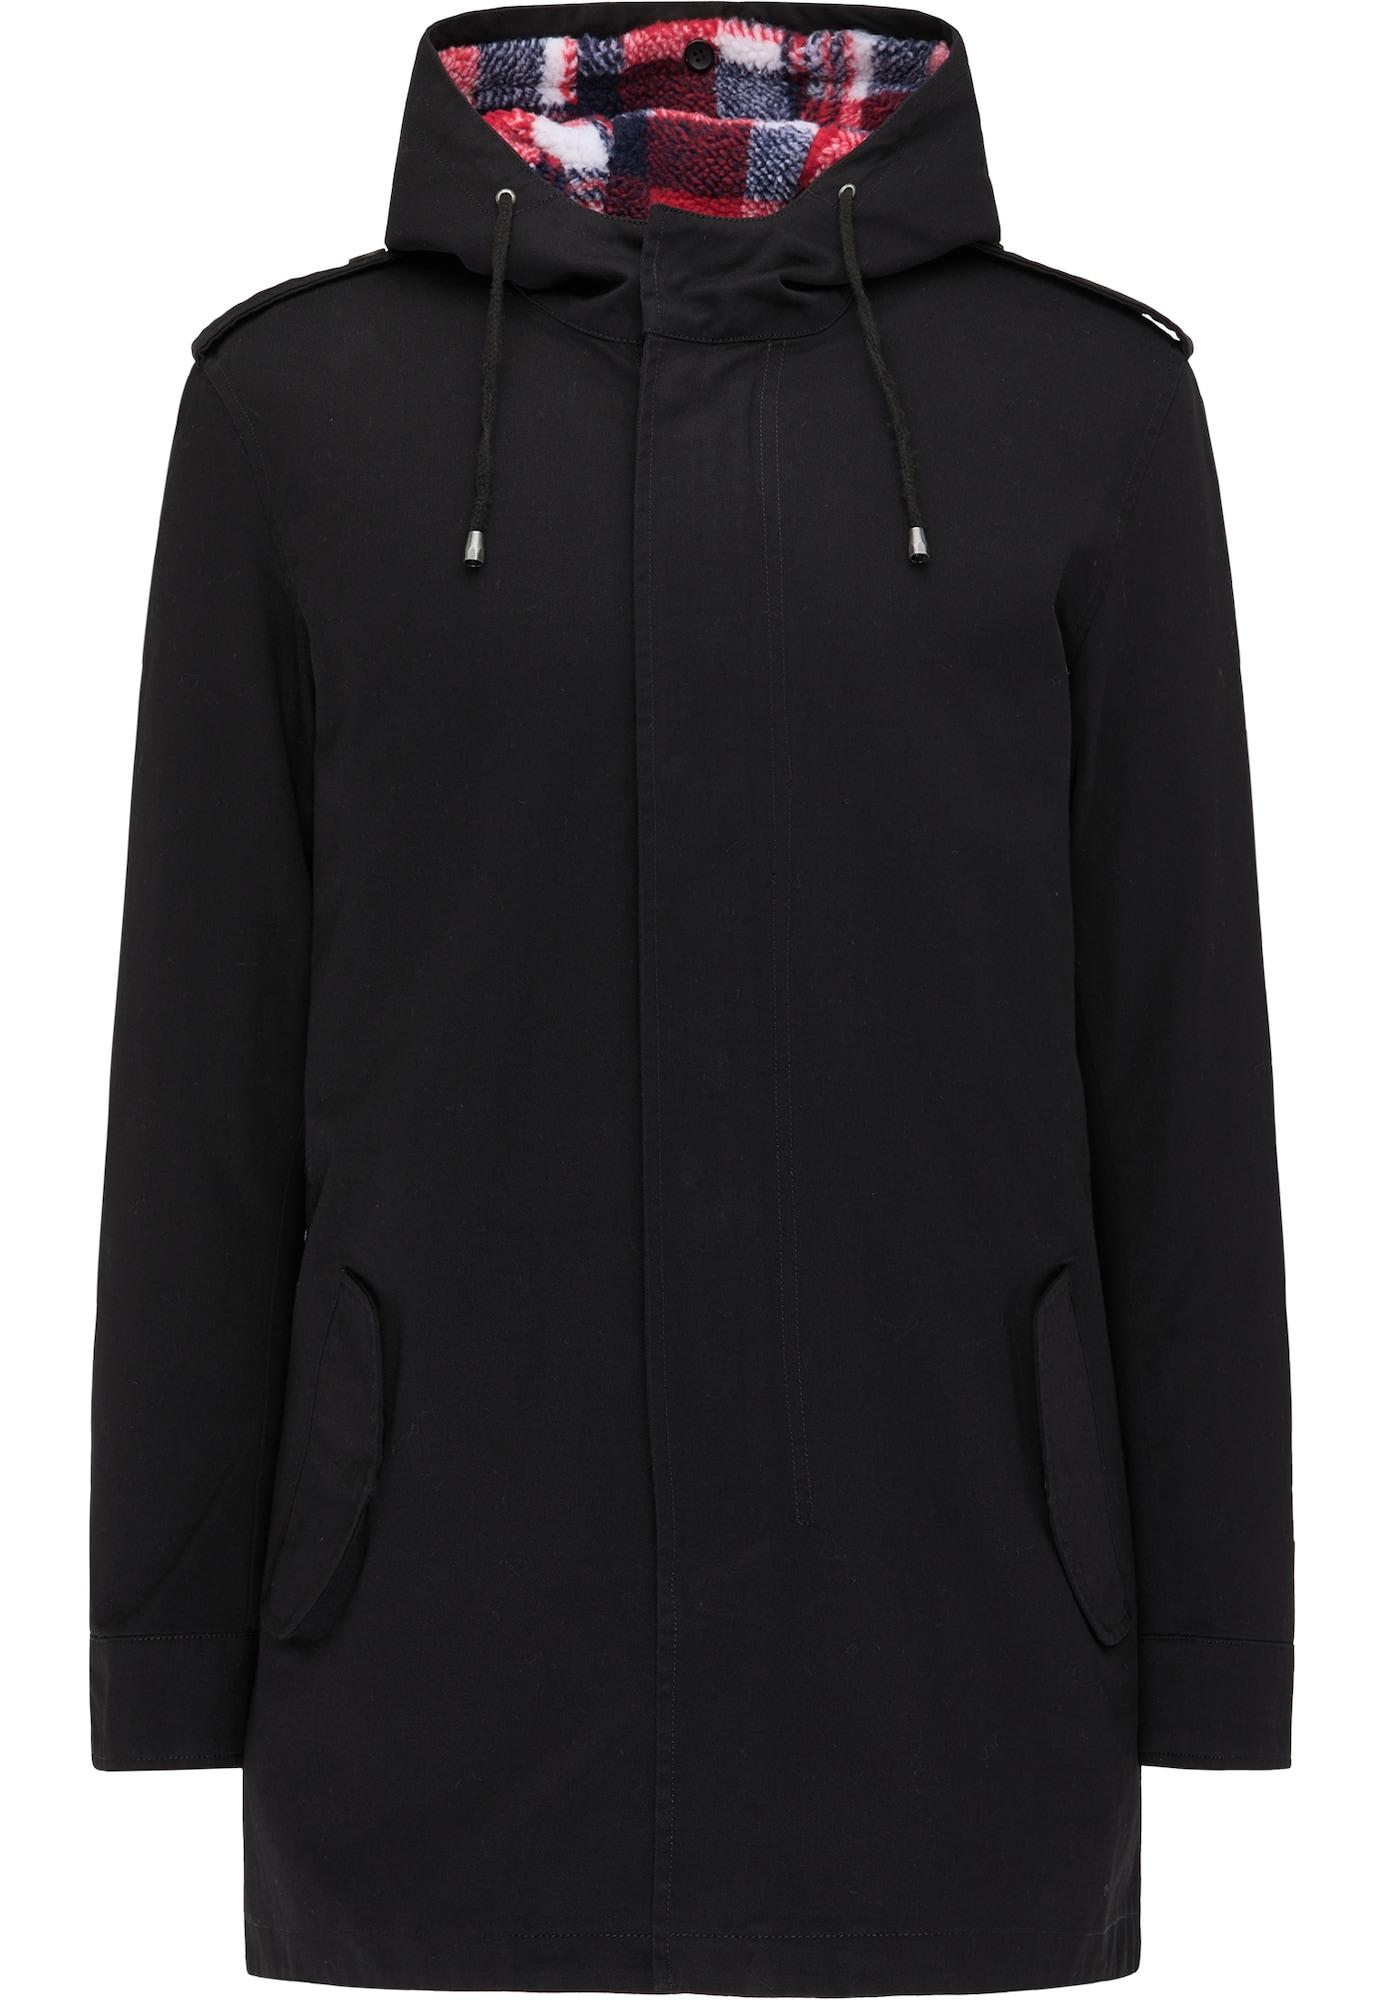 MO Demisezoninis paltas juoda